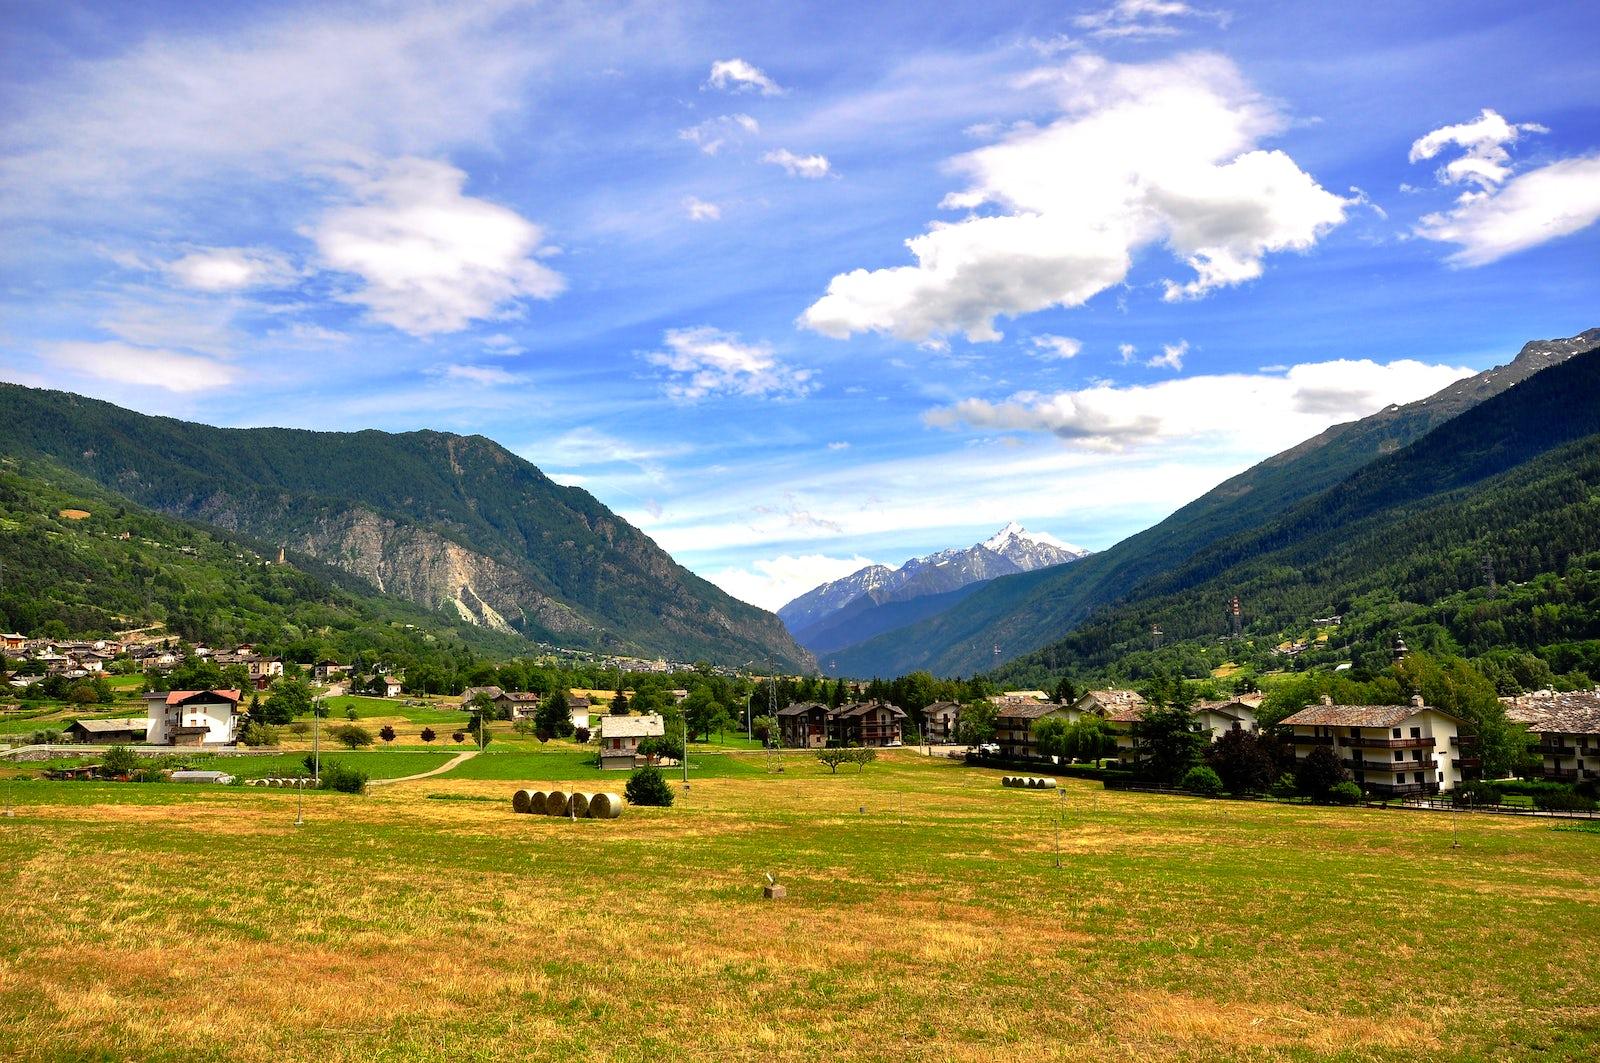 !i18n:es:data.regions:it-aosta-valley.picture.caption